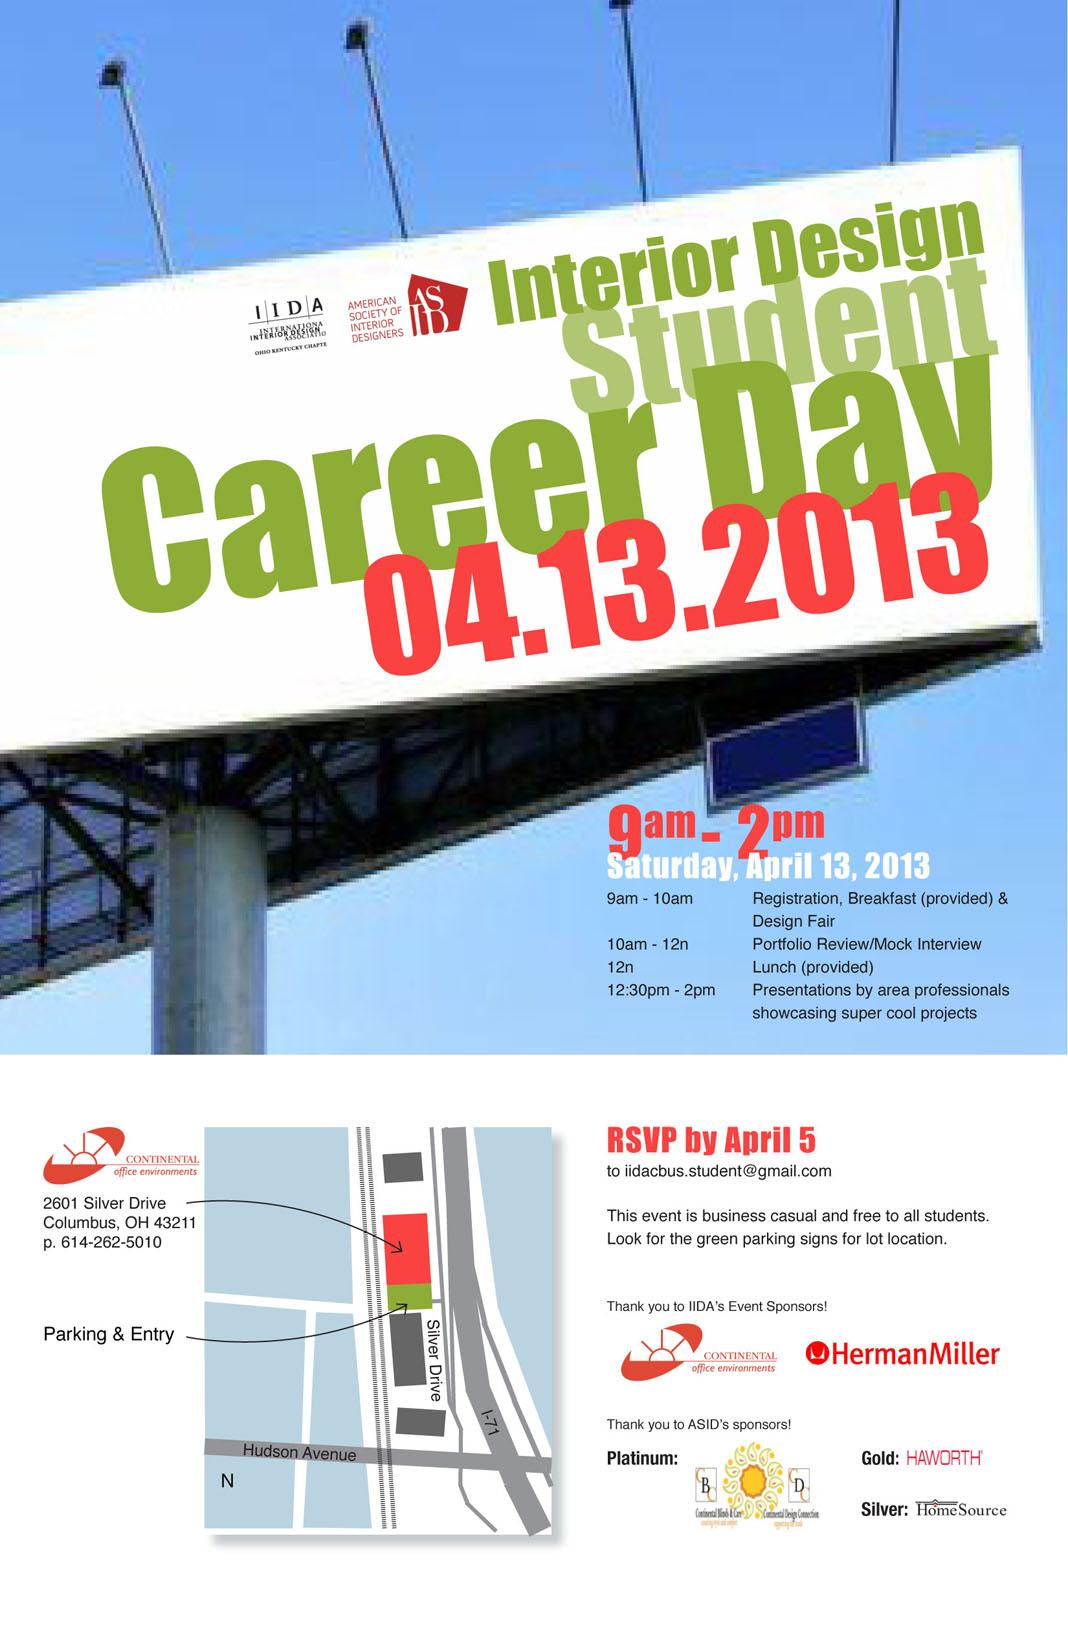 Interior Design Student Career Day 2013 Registration Sat Apr 13 2013 At 9 00 Am Eventbrite